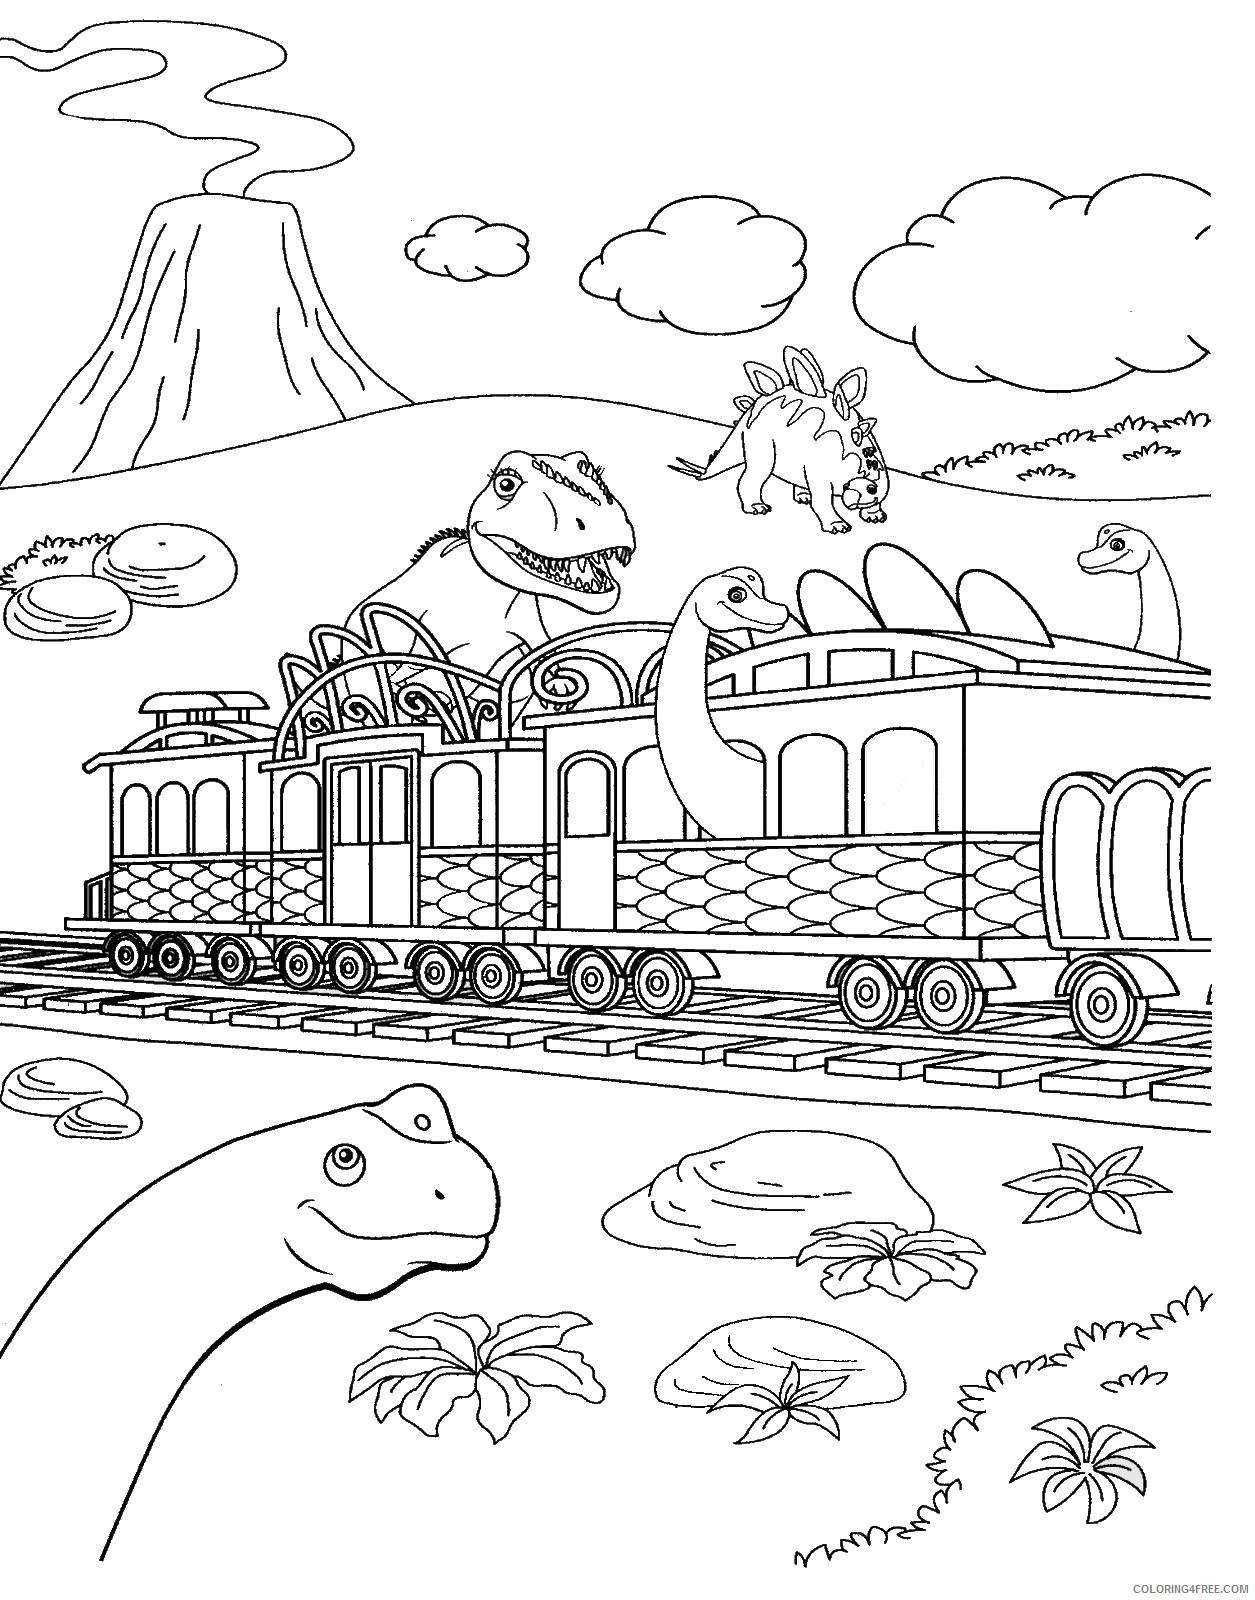 Dinosaur Train Coloring Pages Cartoons Dino Train Cl 19 Printable 2020 2240 Coloring4free Coloring4free Com